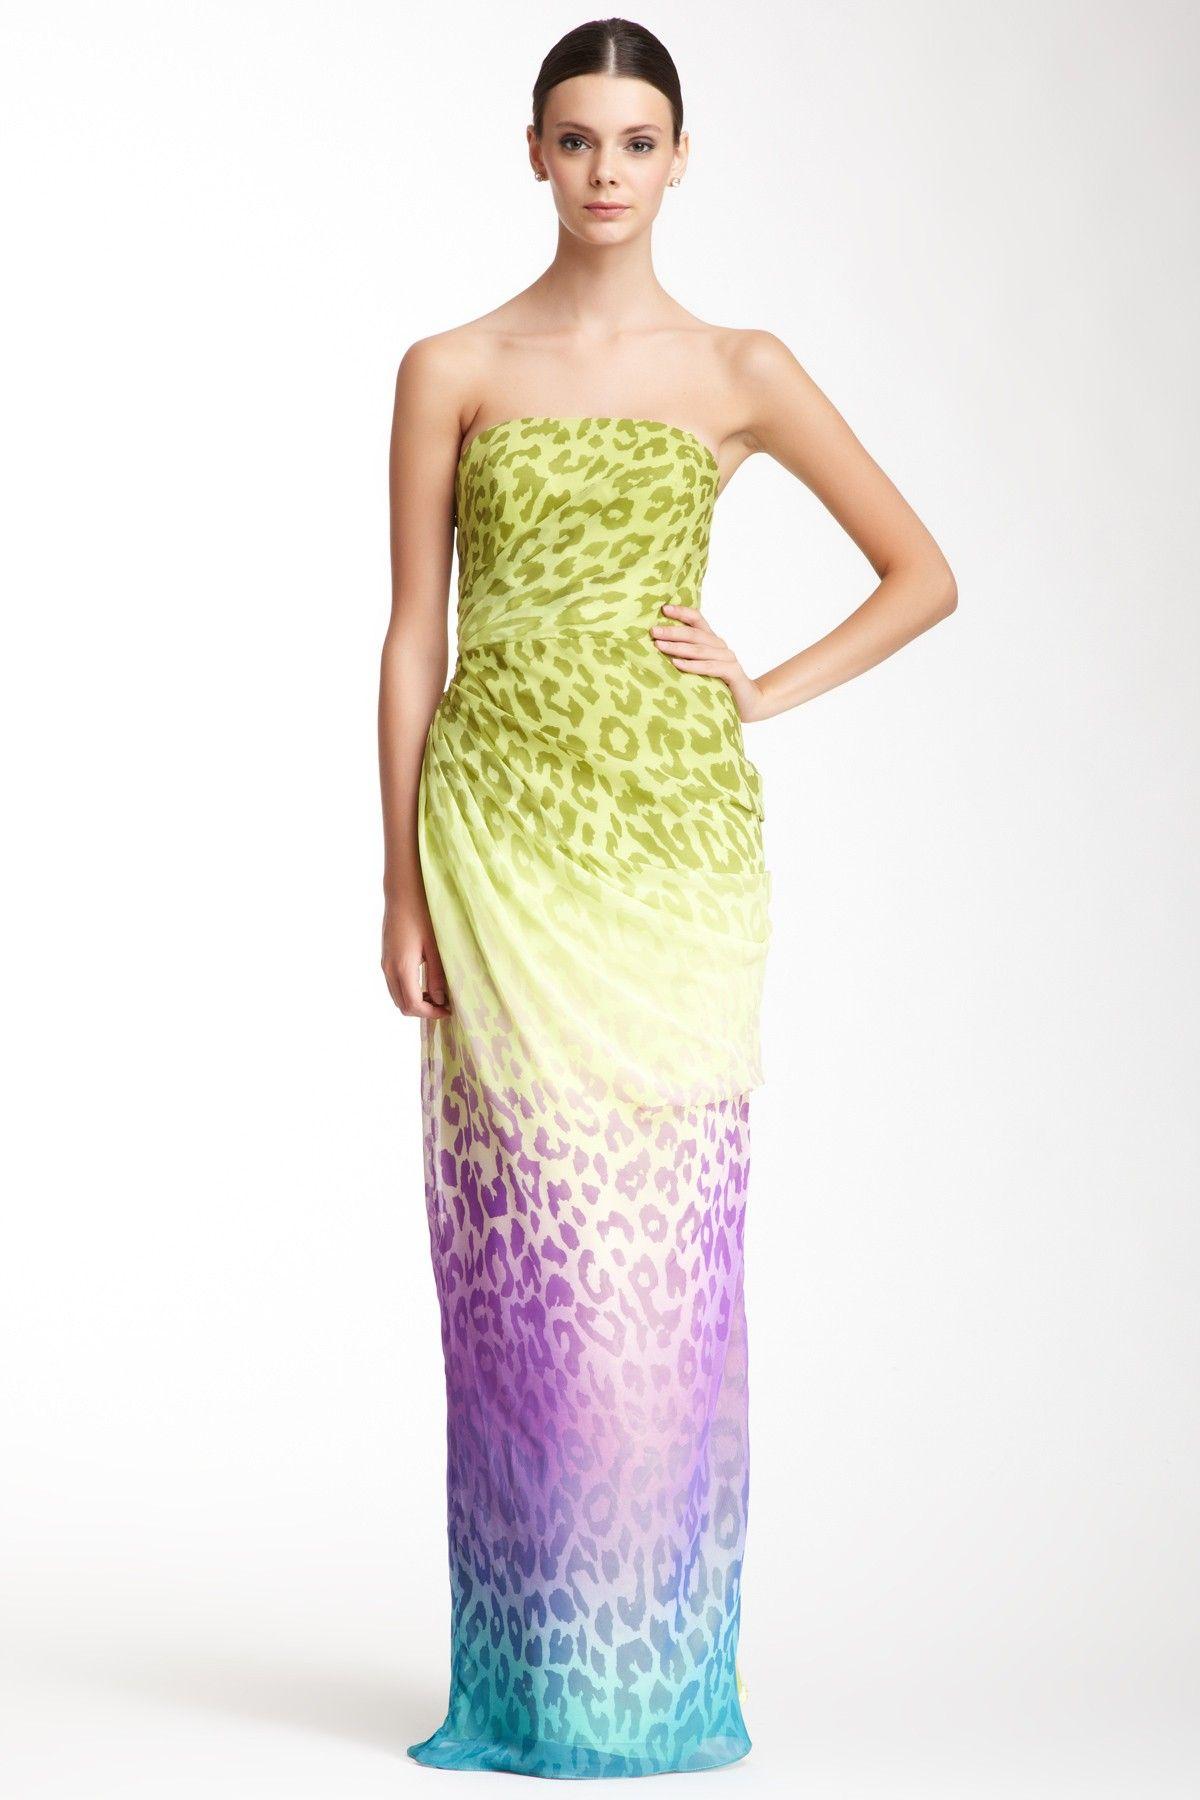 Dalia MacPhee Strapless Cheetah Print Long Dress by Dalia MacPhee on @HauteLook